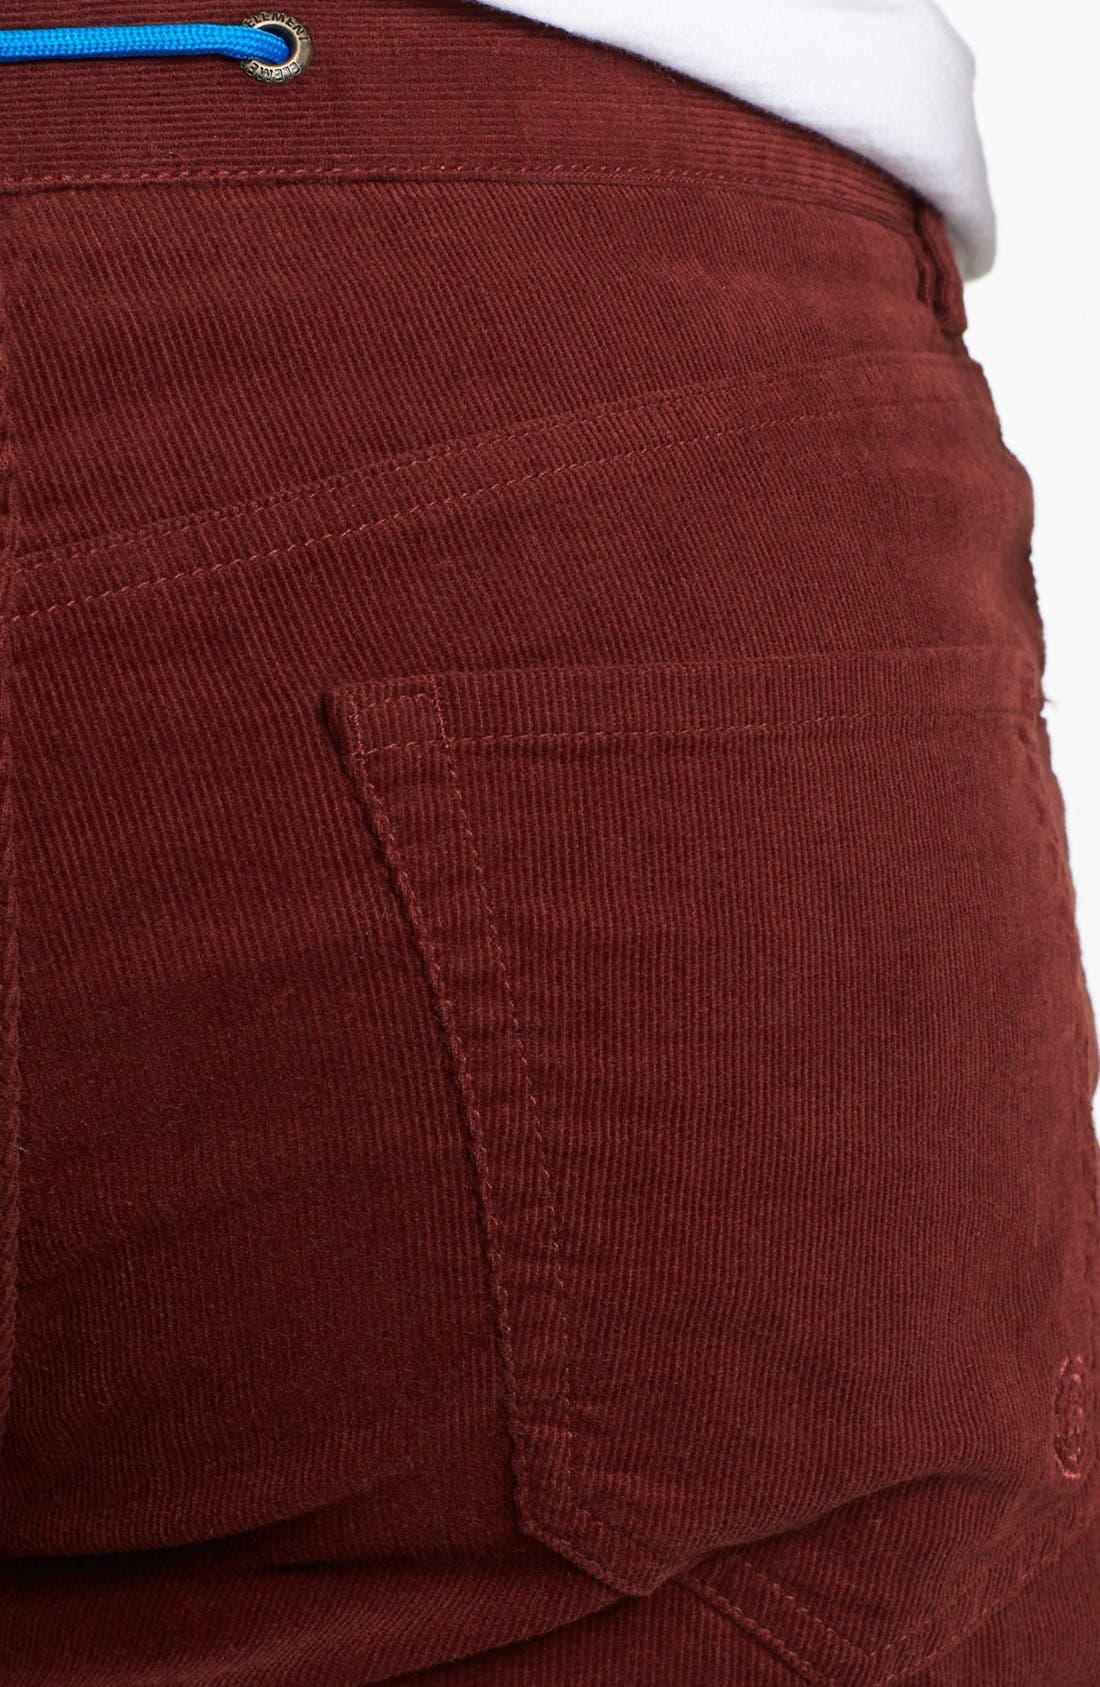 Alternate Image 3  - Element 'Essex' Corduroy Shorts